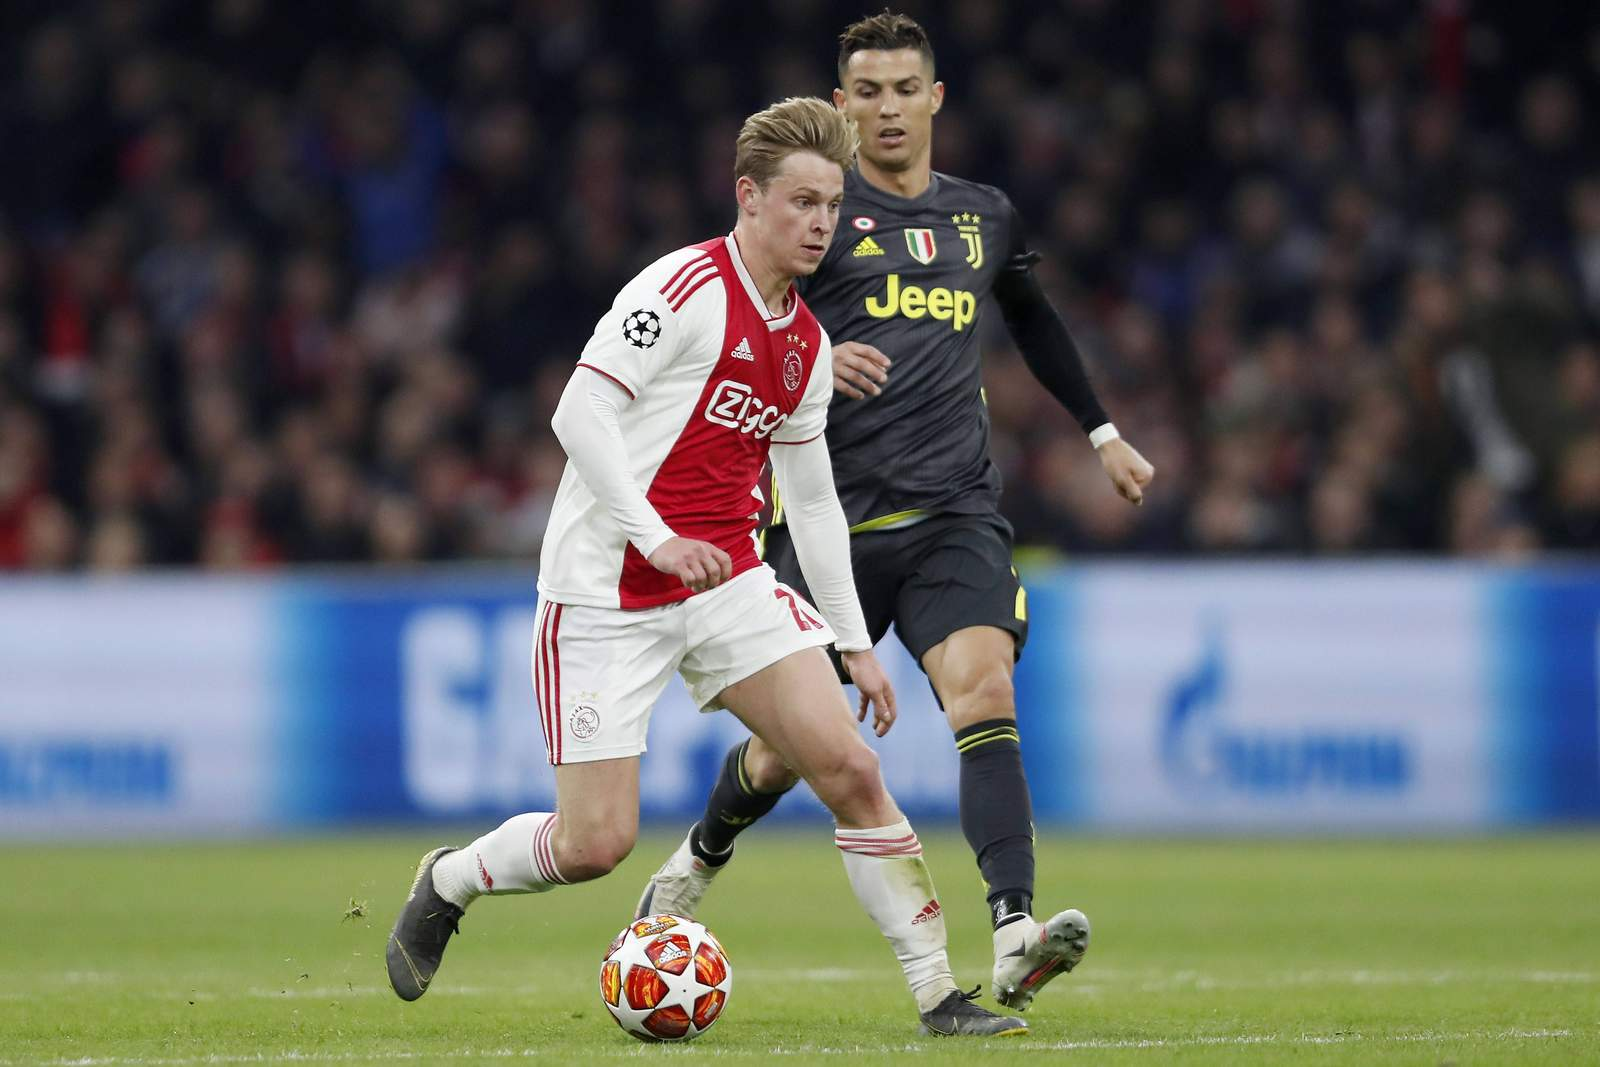 Setzt sich de Jong gegen Ronaldo durch? Jetzt auf Juventus gegen Ajax wetten